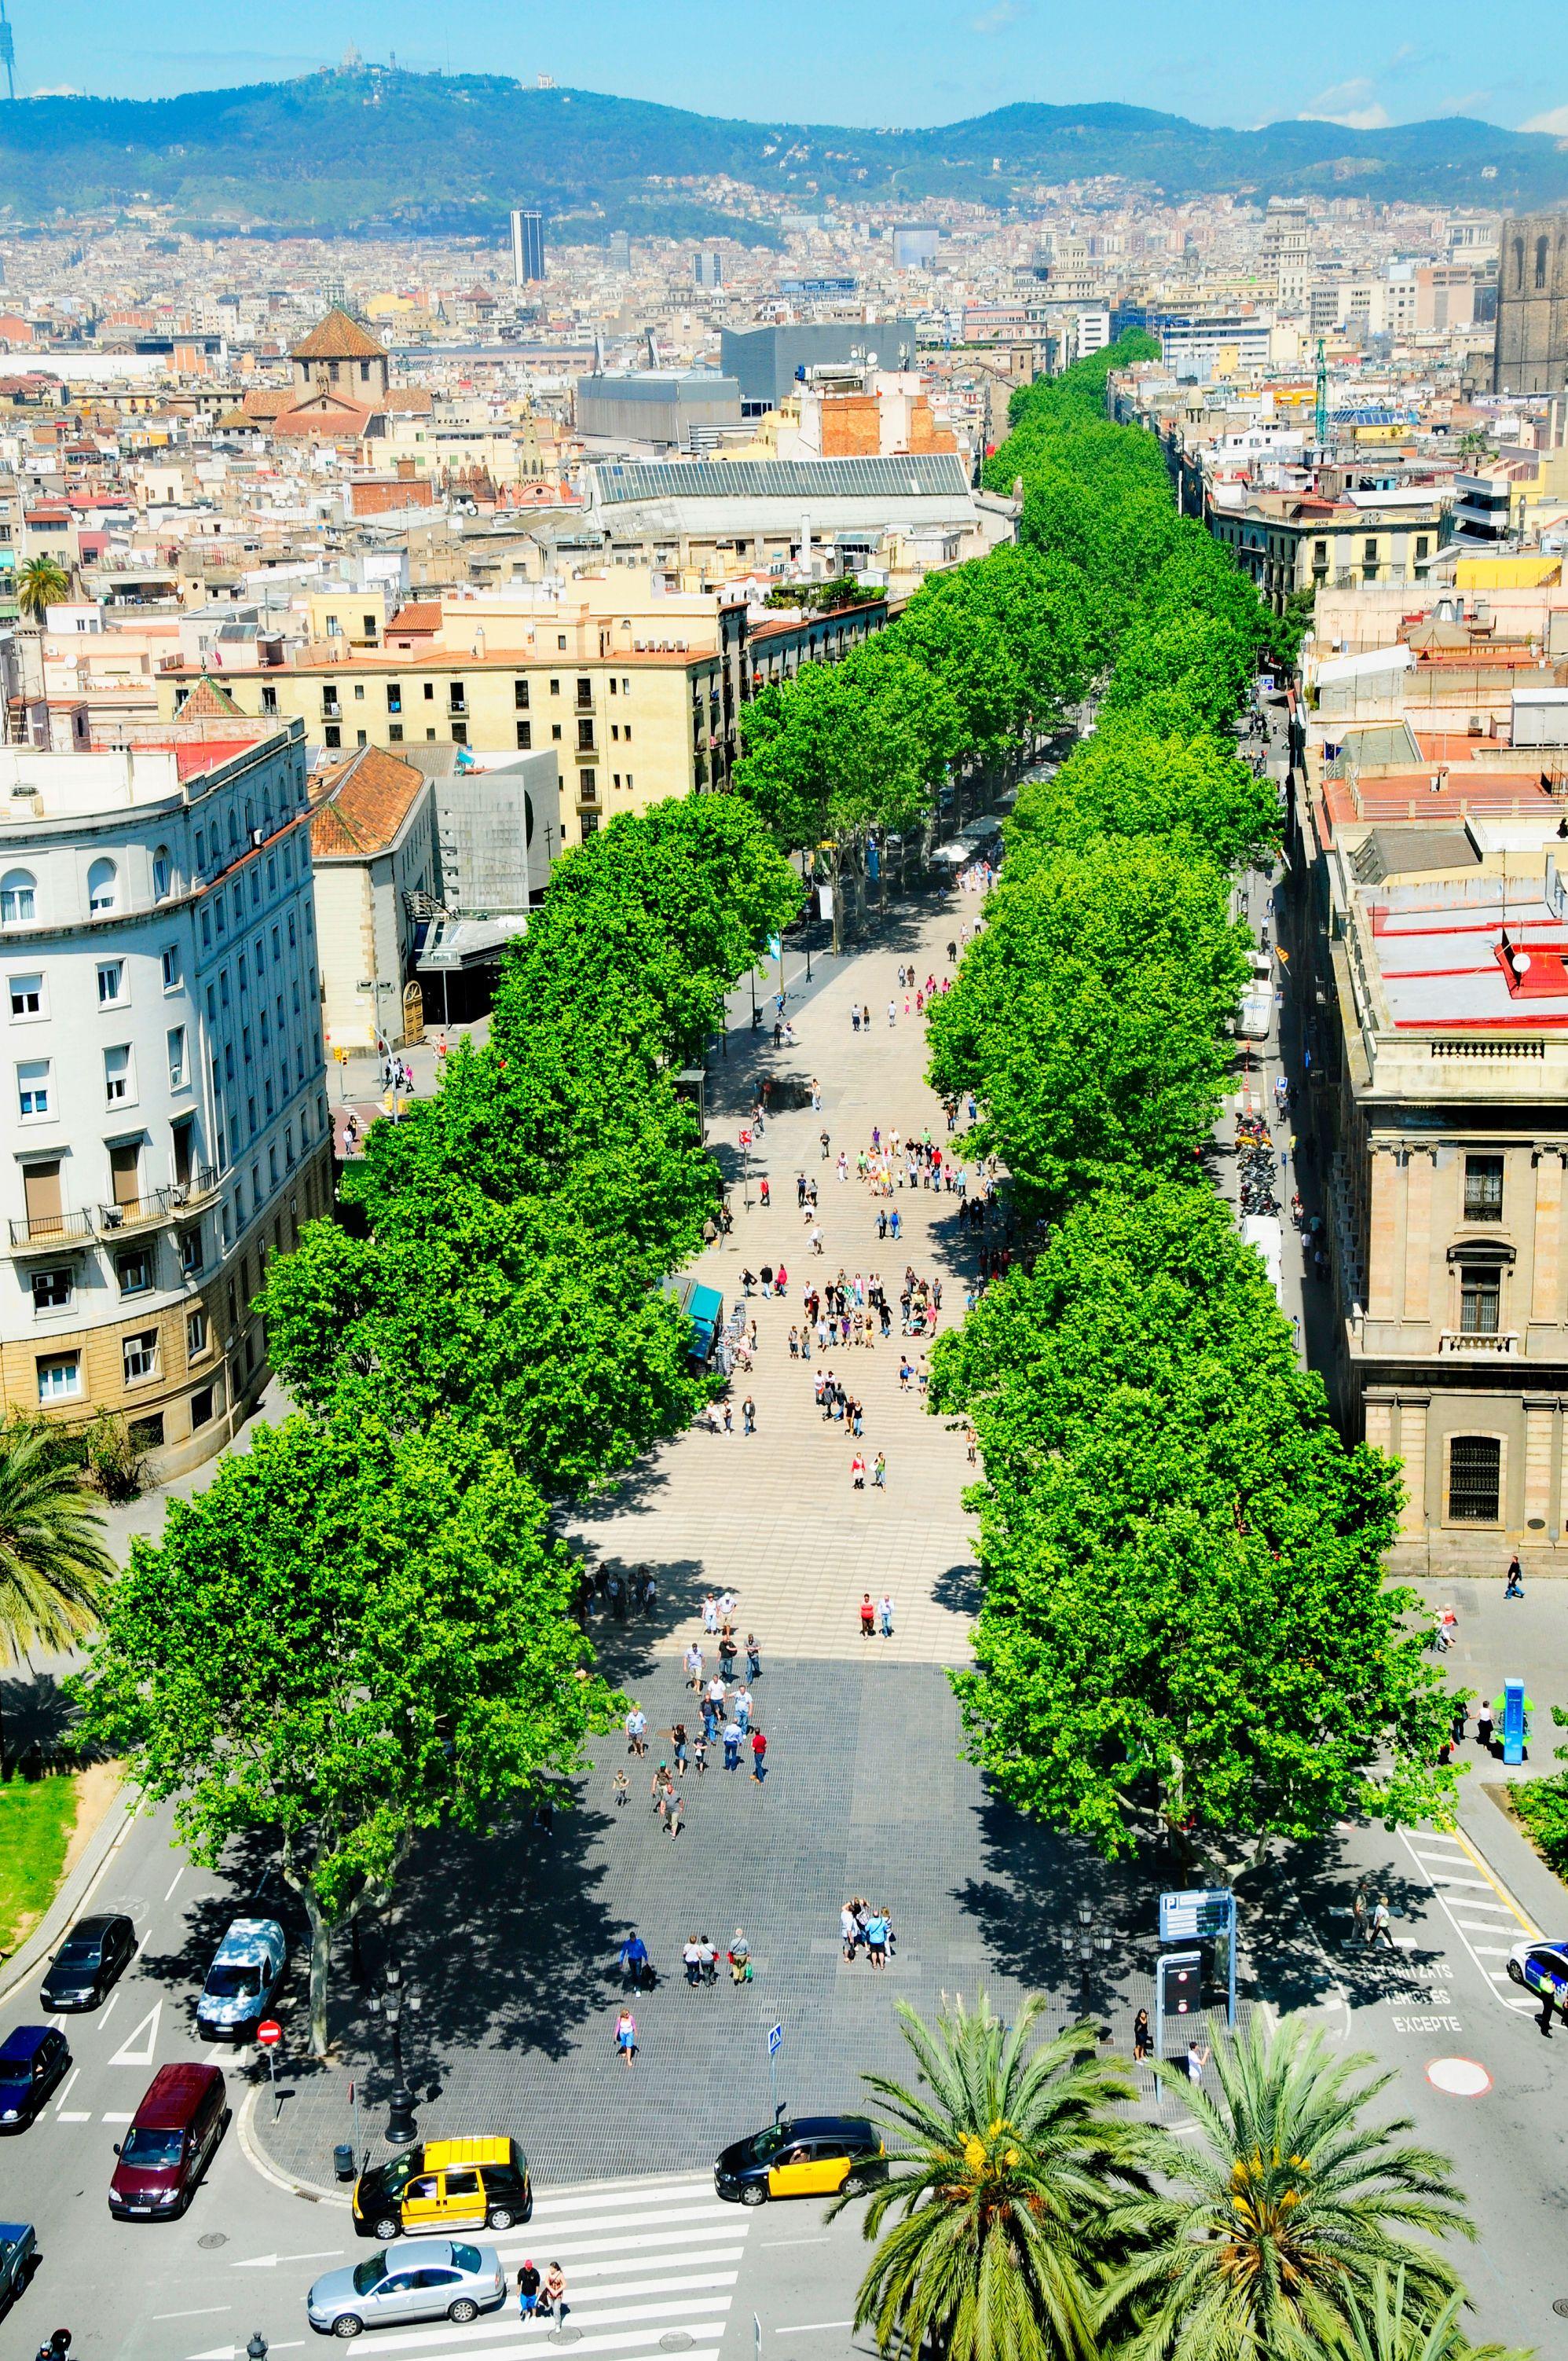 La rambla barcelona places i want to visit pinterest - La botigueta barcelona ...